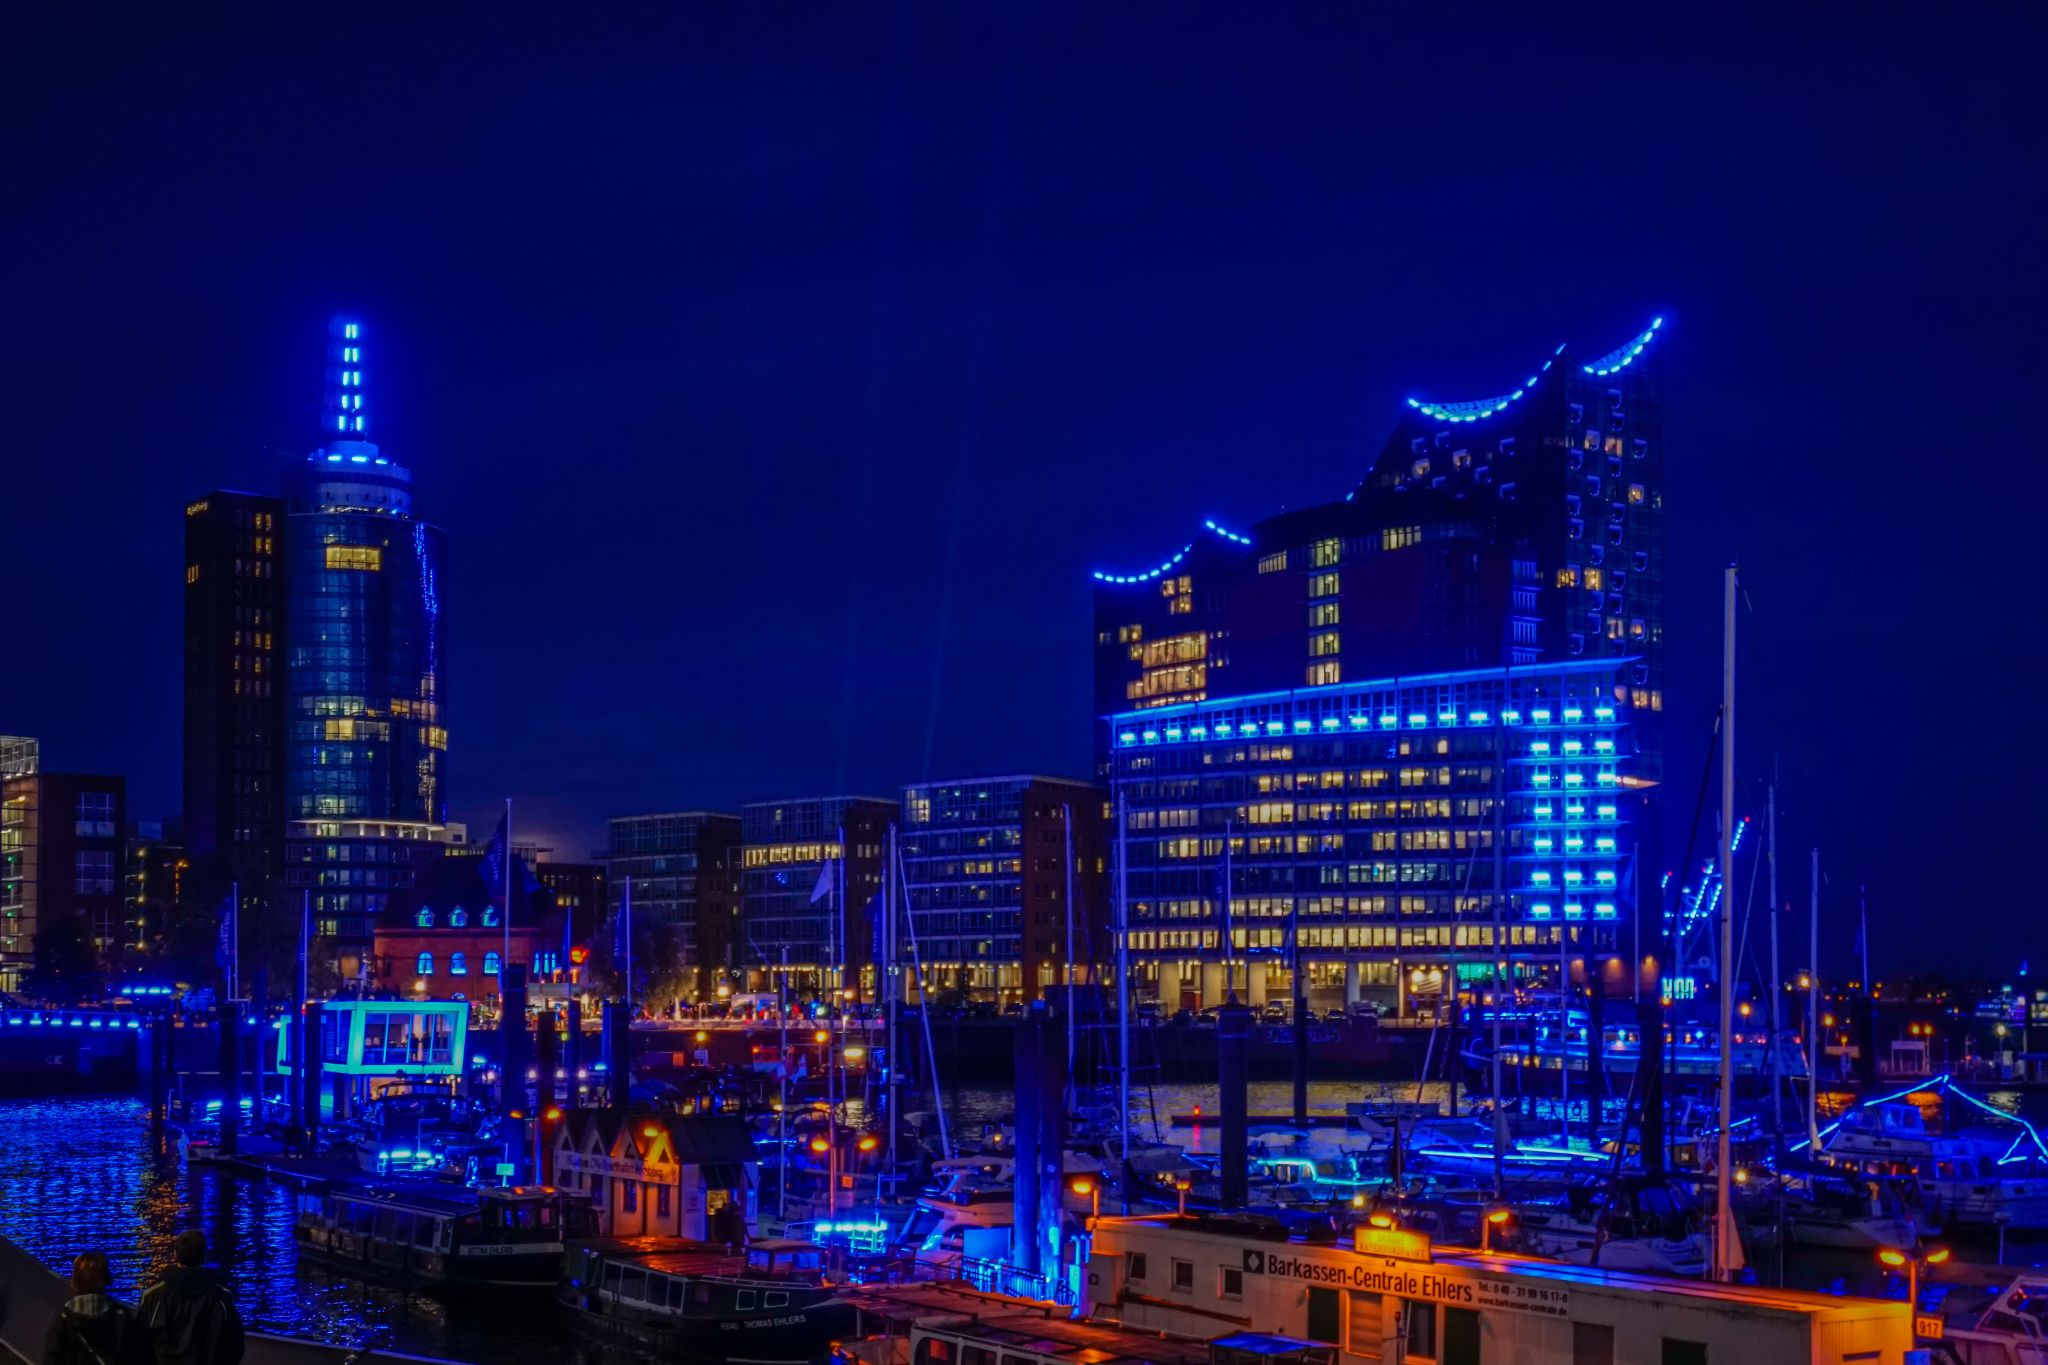 Elbphilharmonie Hamburg, Germany